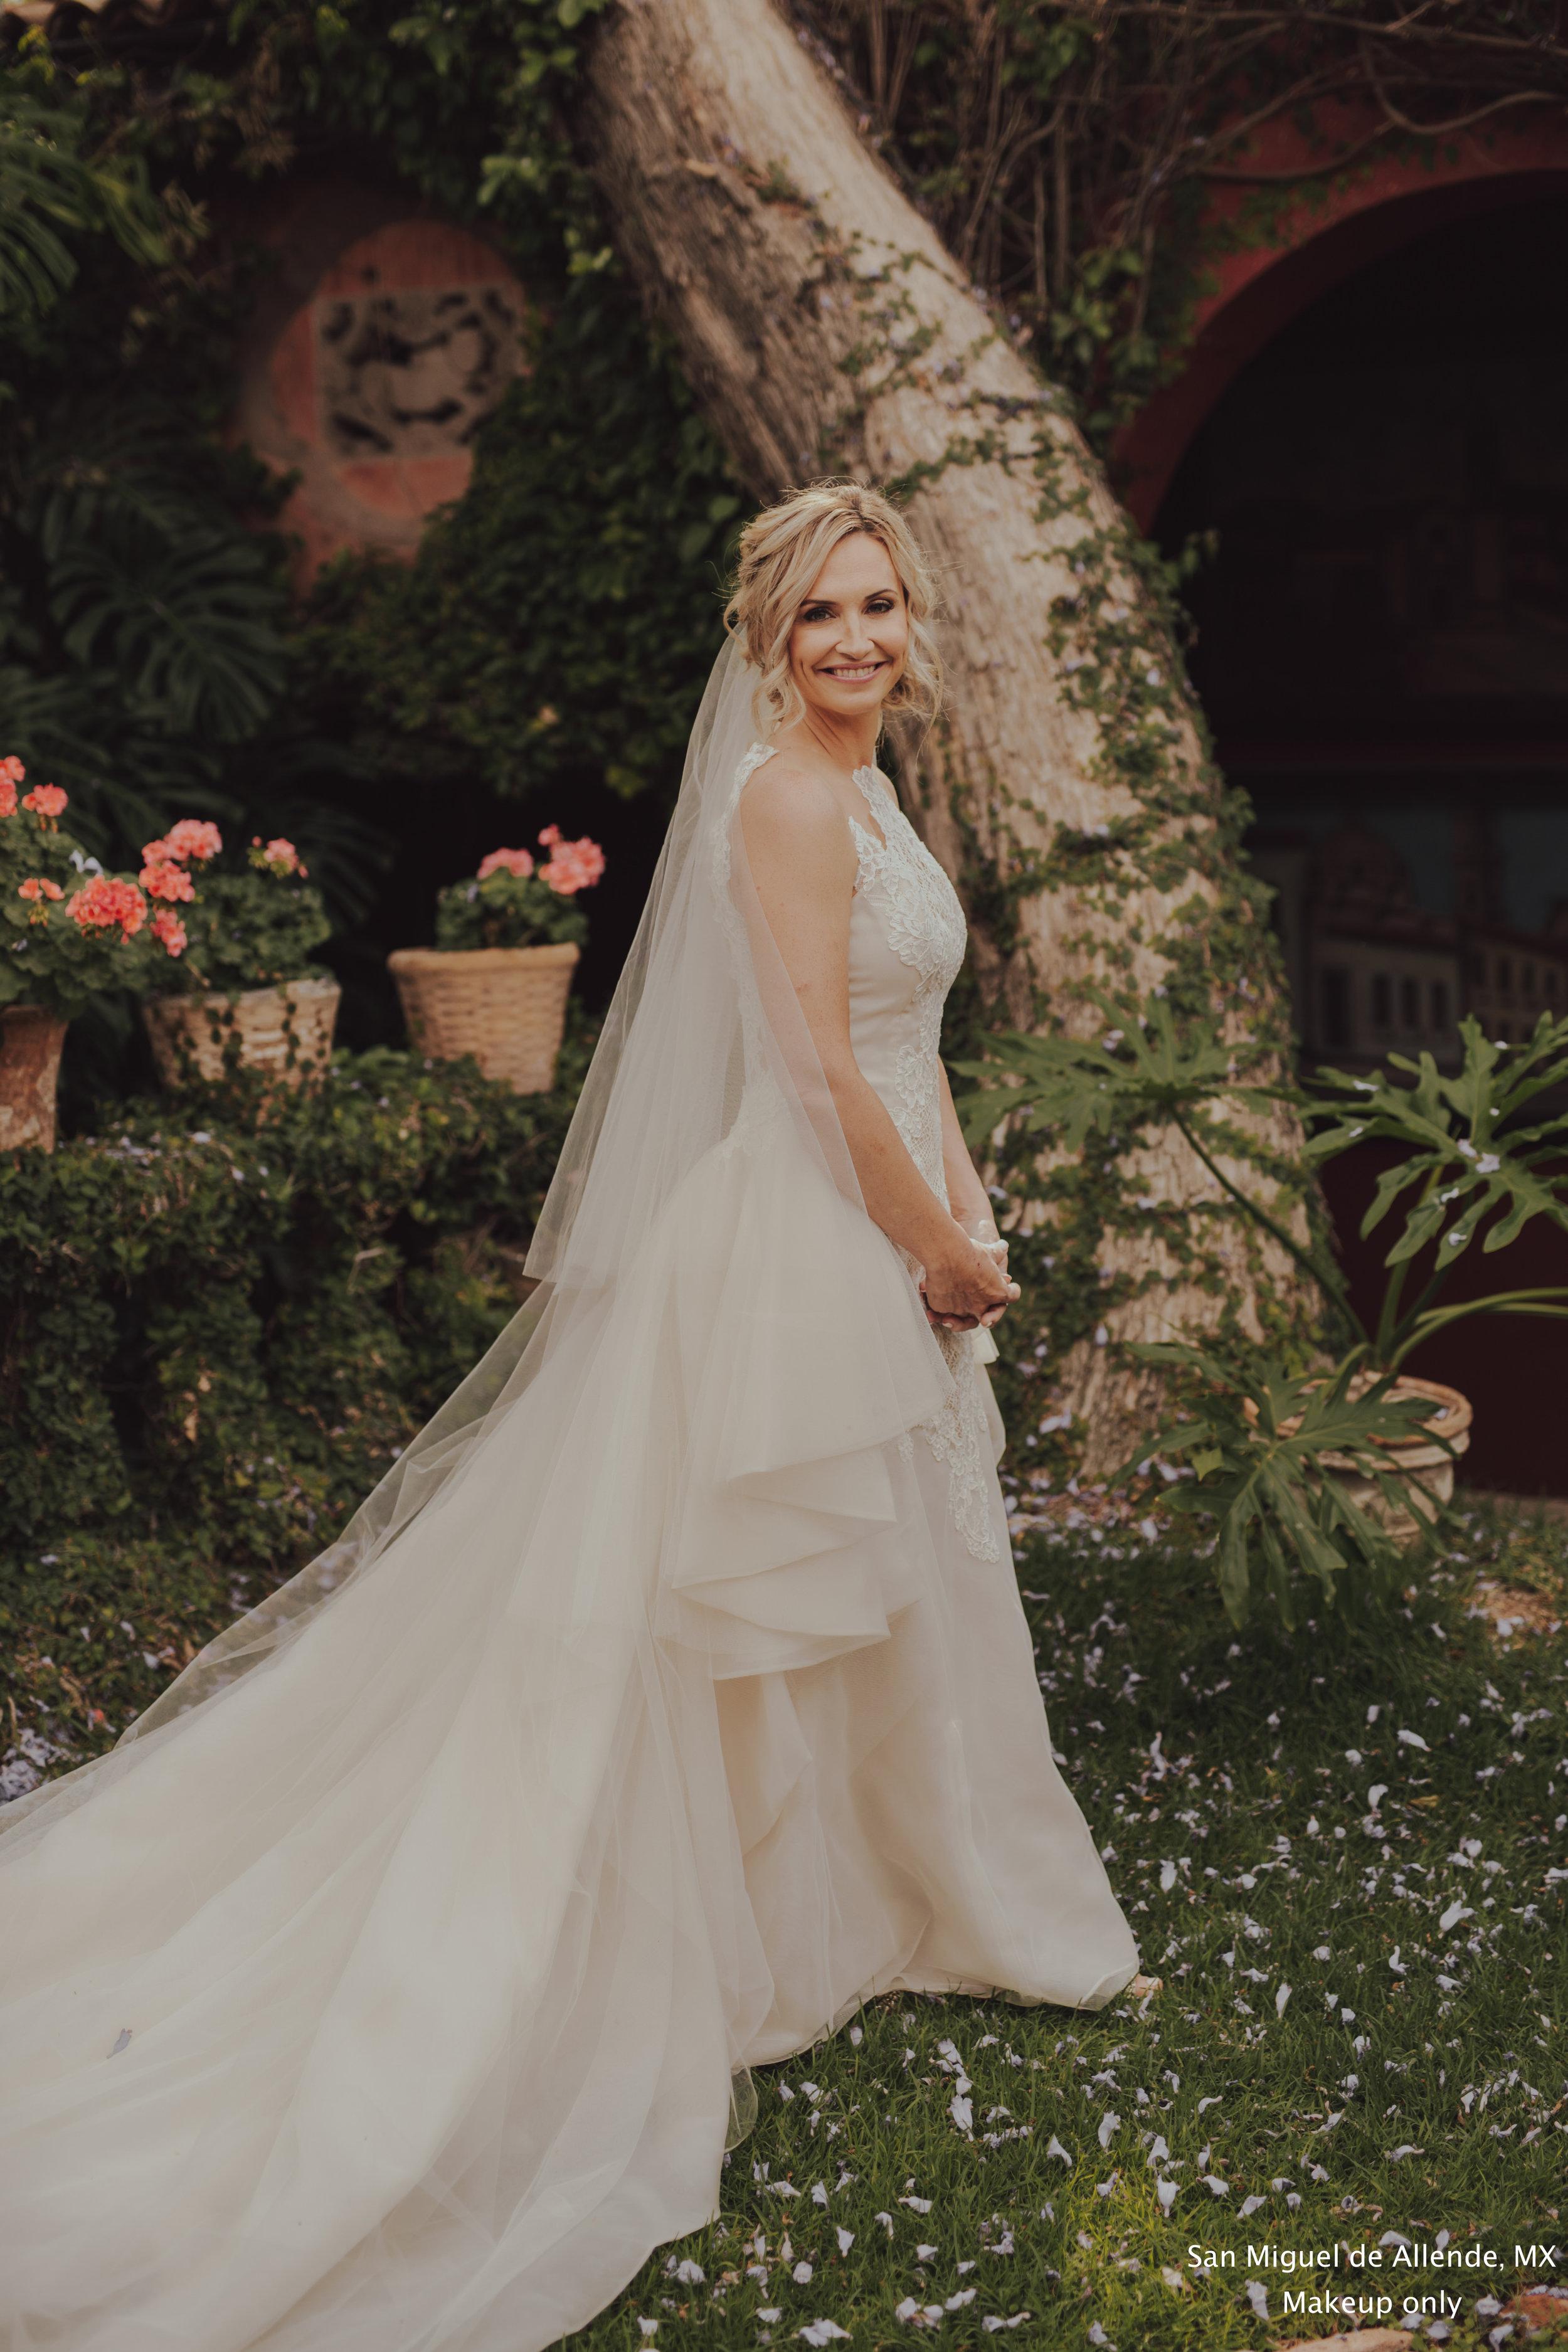 San Miguel de Allende/ Bridal Makeup